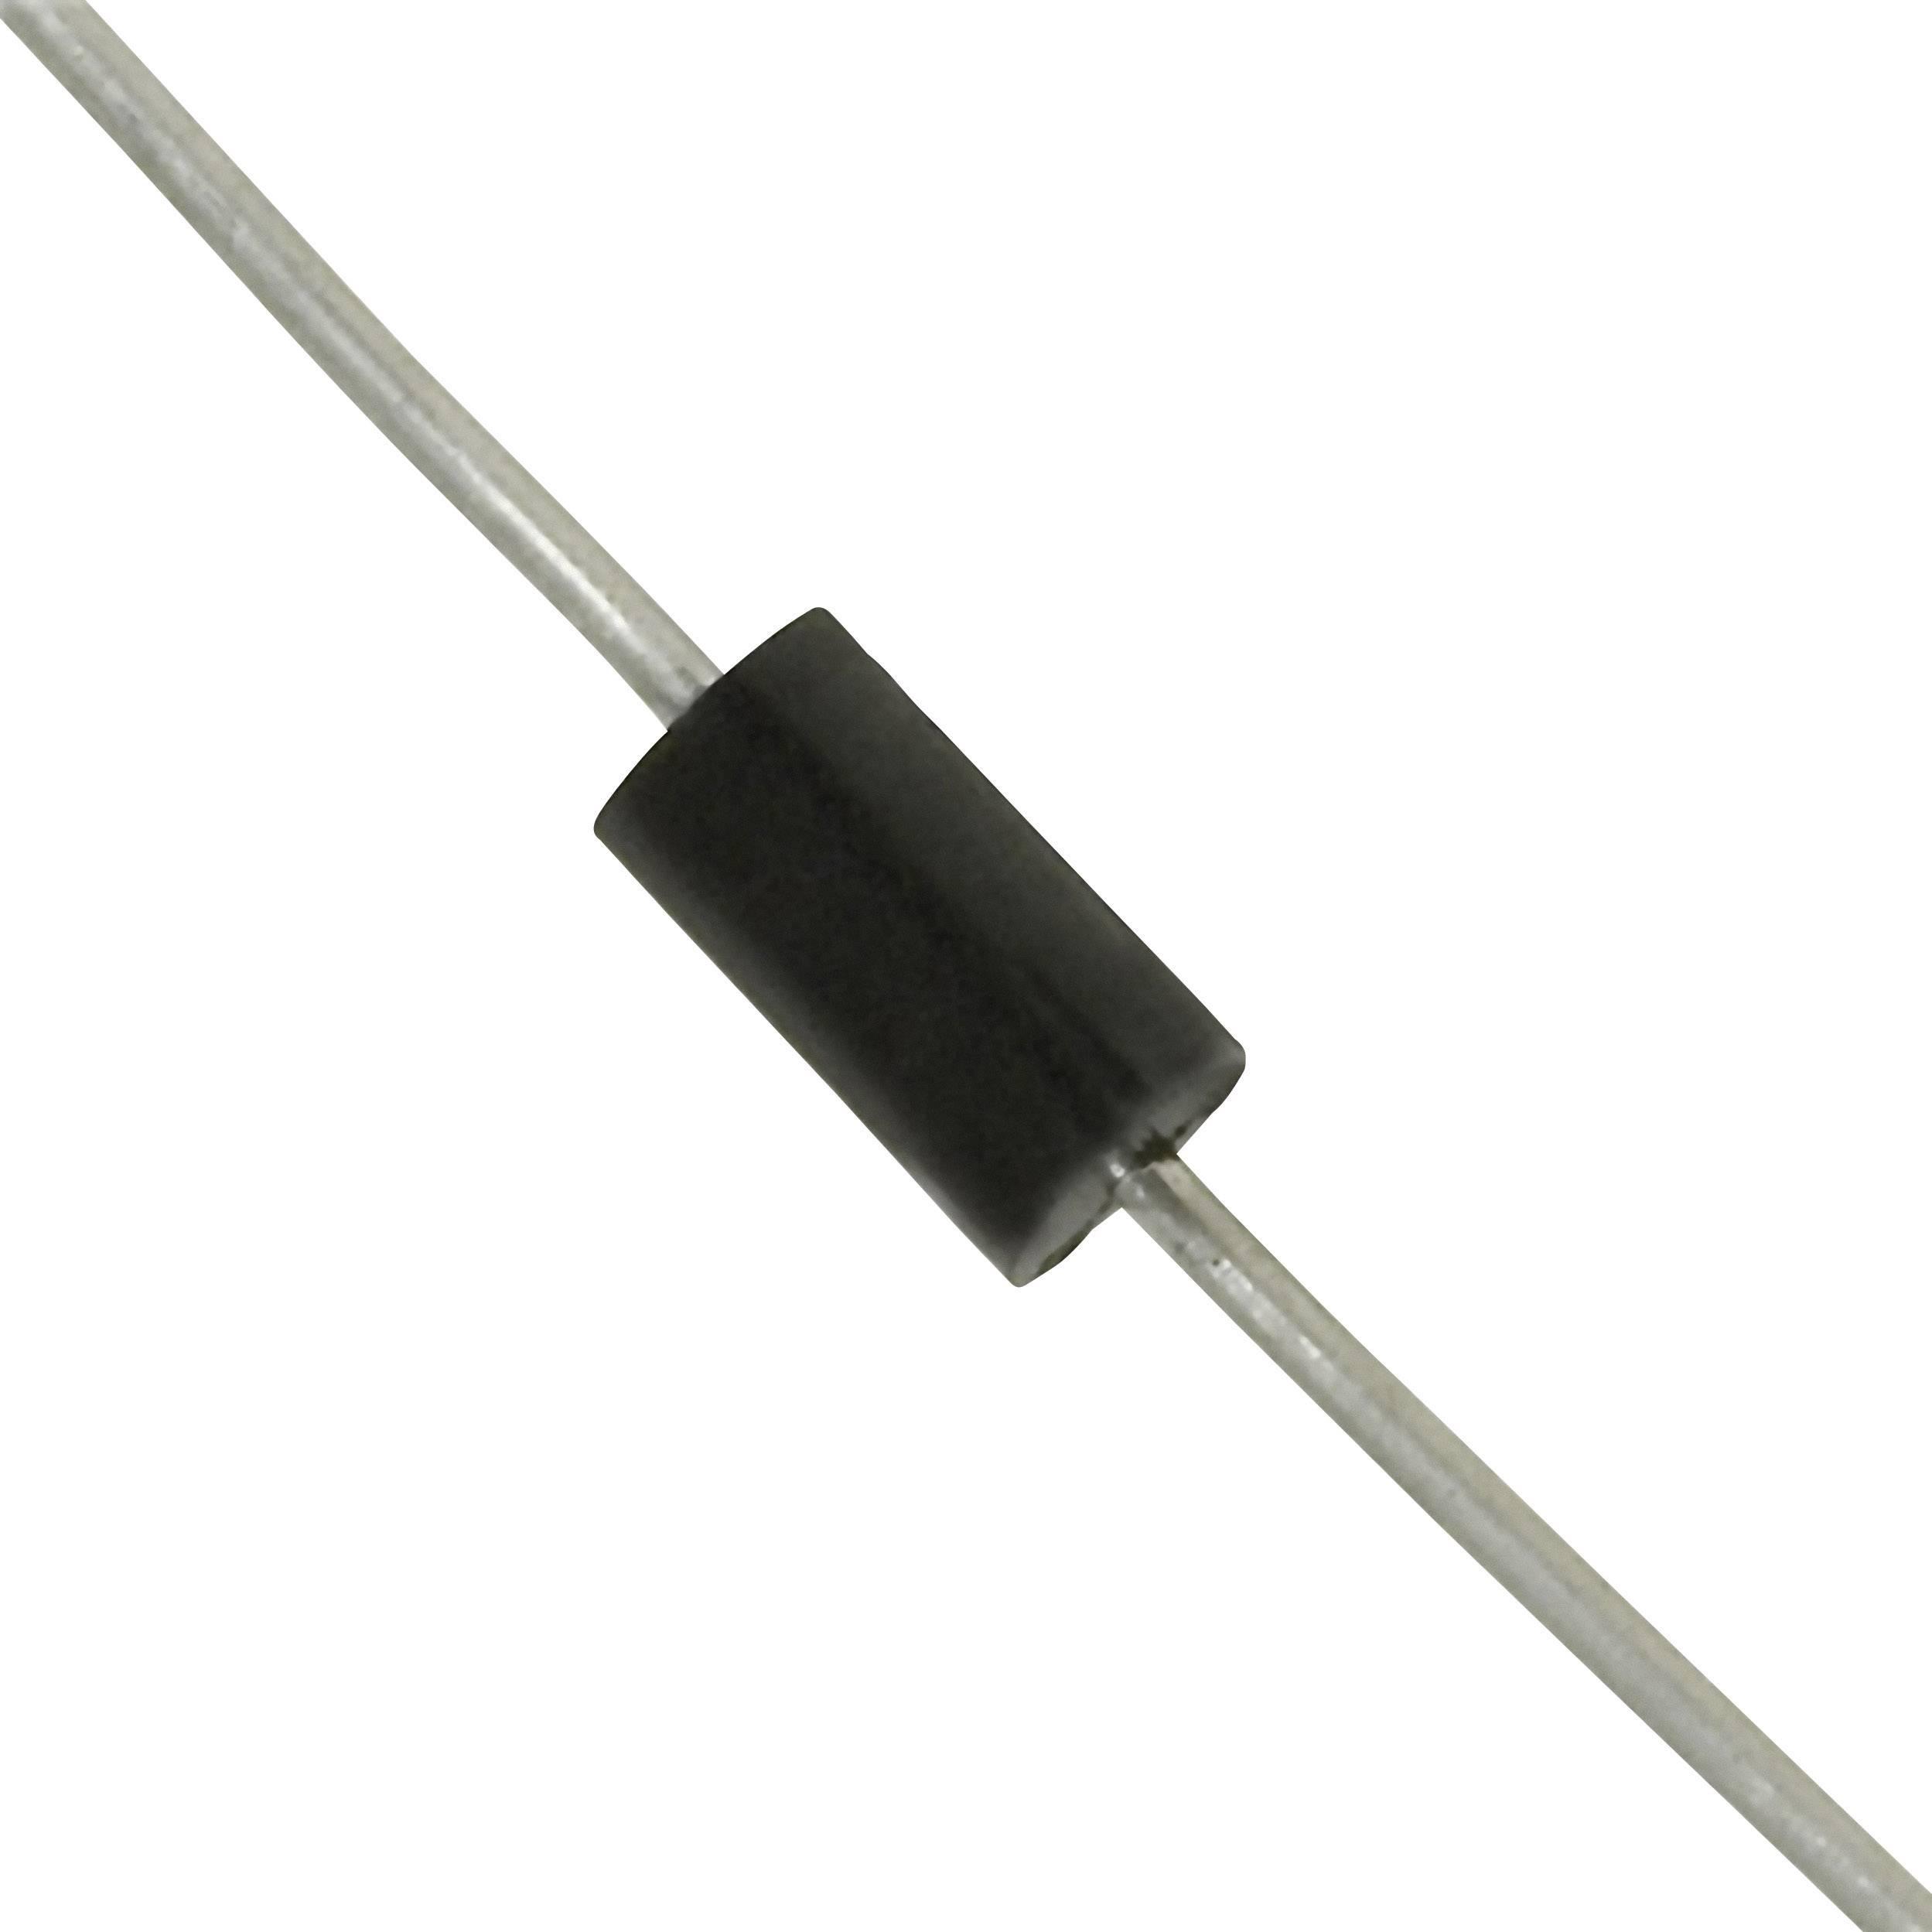 TVS dióda Littelfuse P6KE440A, DO-15, 418 V, 600 W